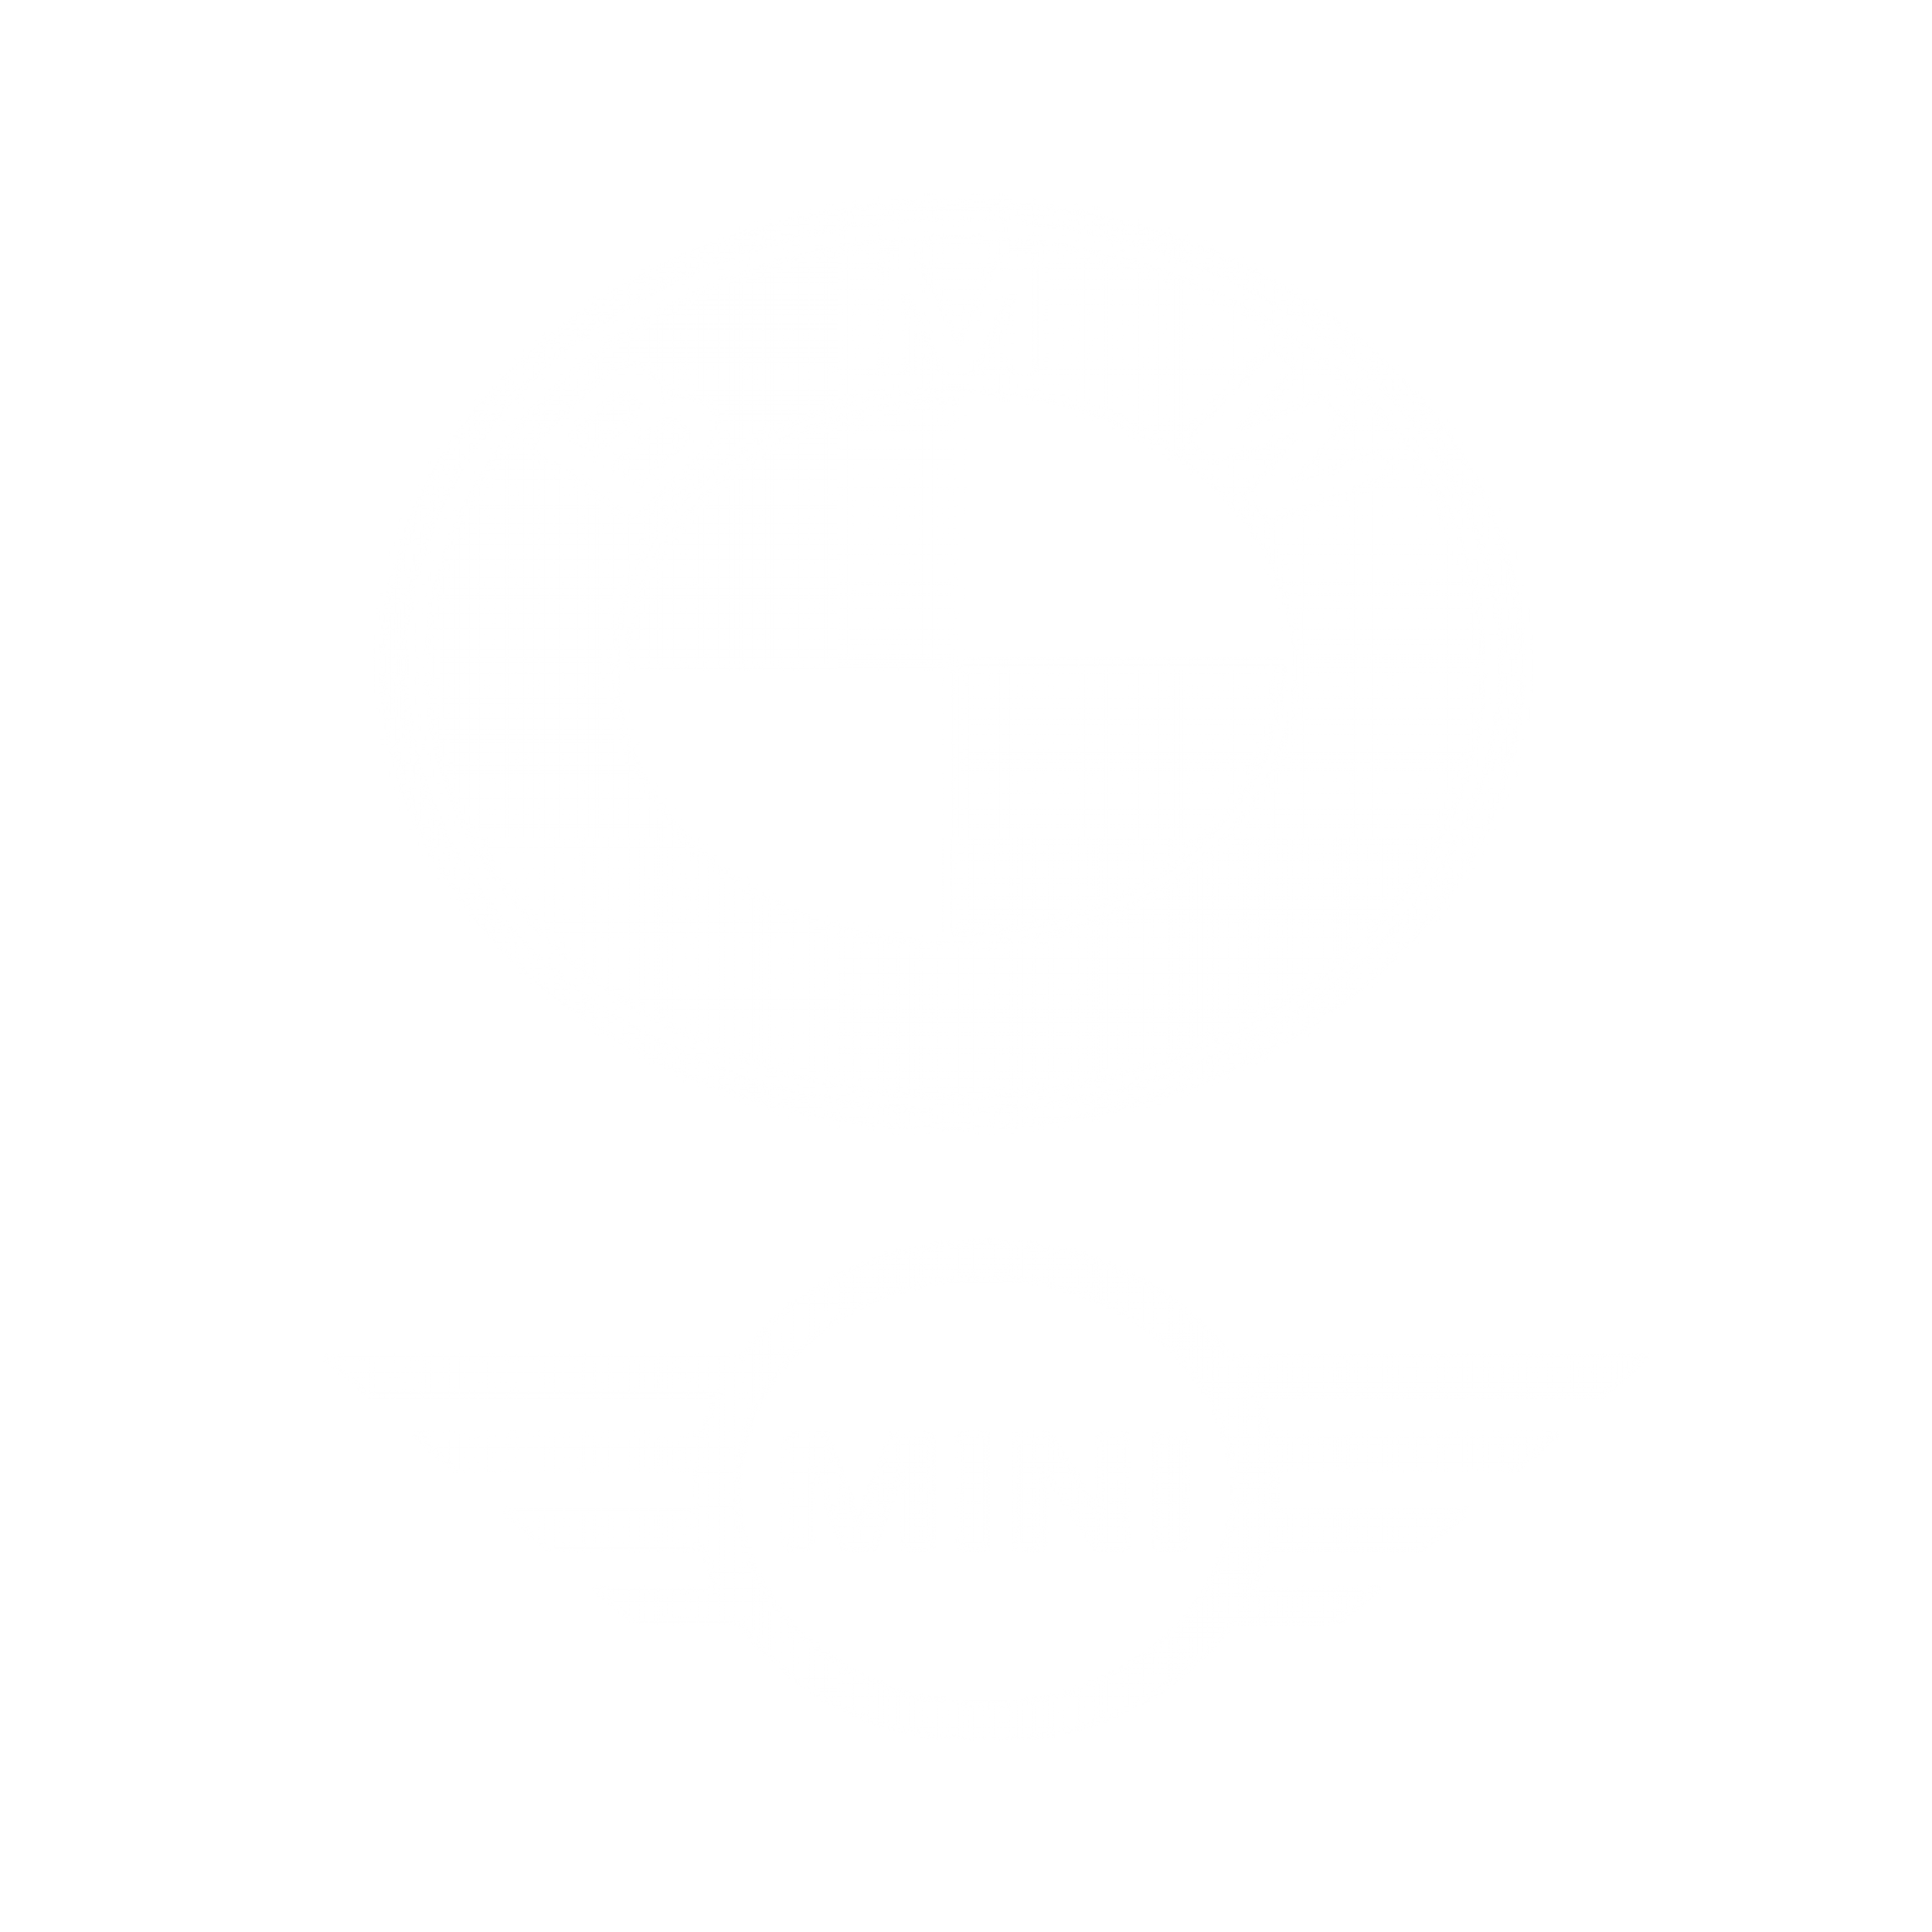 BMW MNI